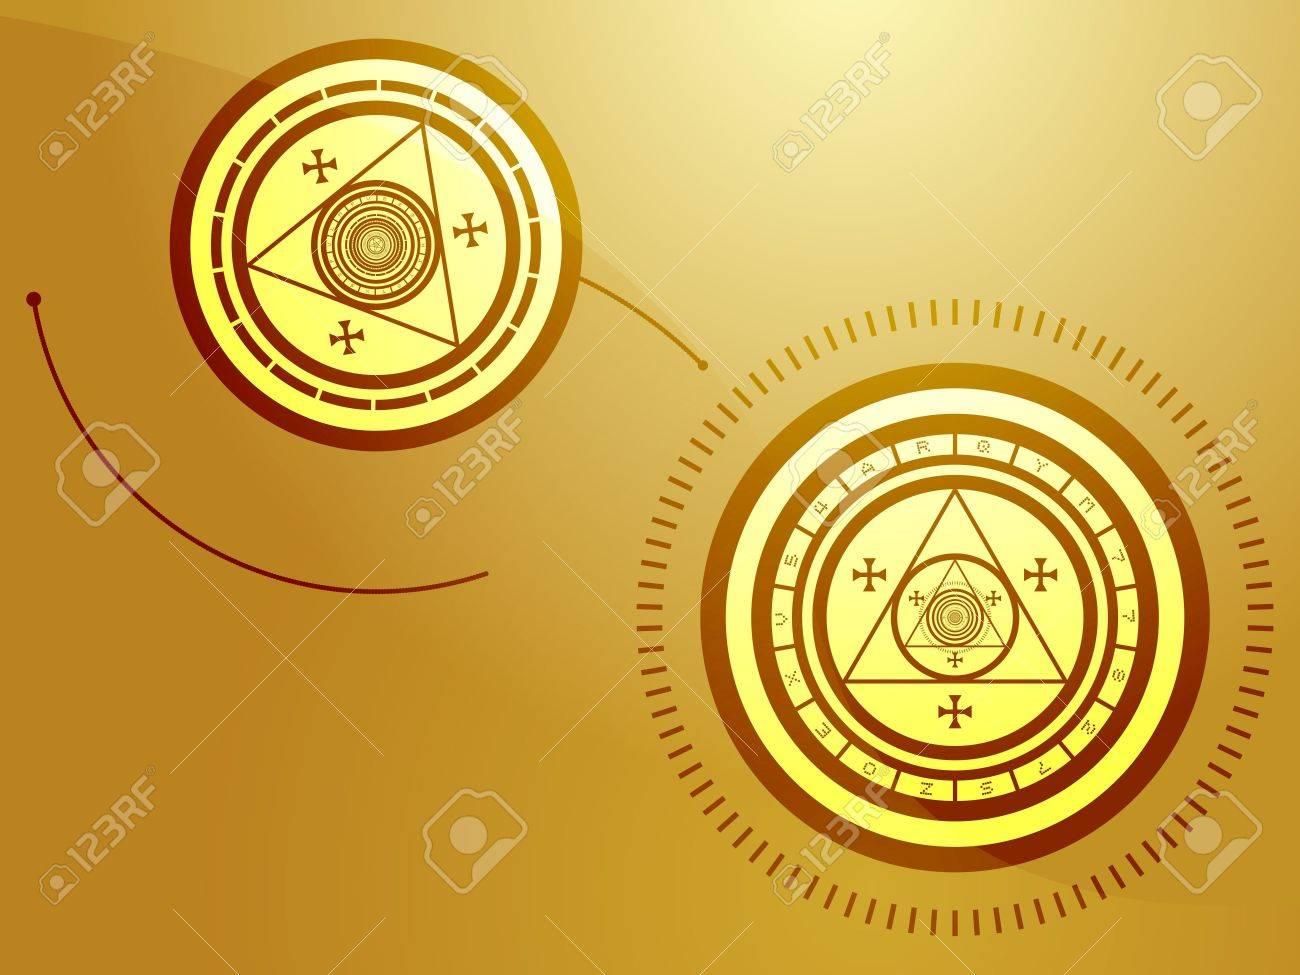 Wierd arcane symbols that look strange and occult stock photo wierd arcane symbols that look strange and occult stock photo 3857270 biocorpaavc Choice Image